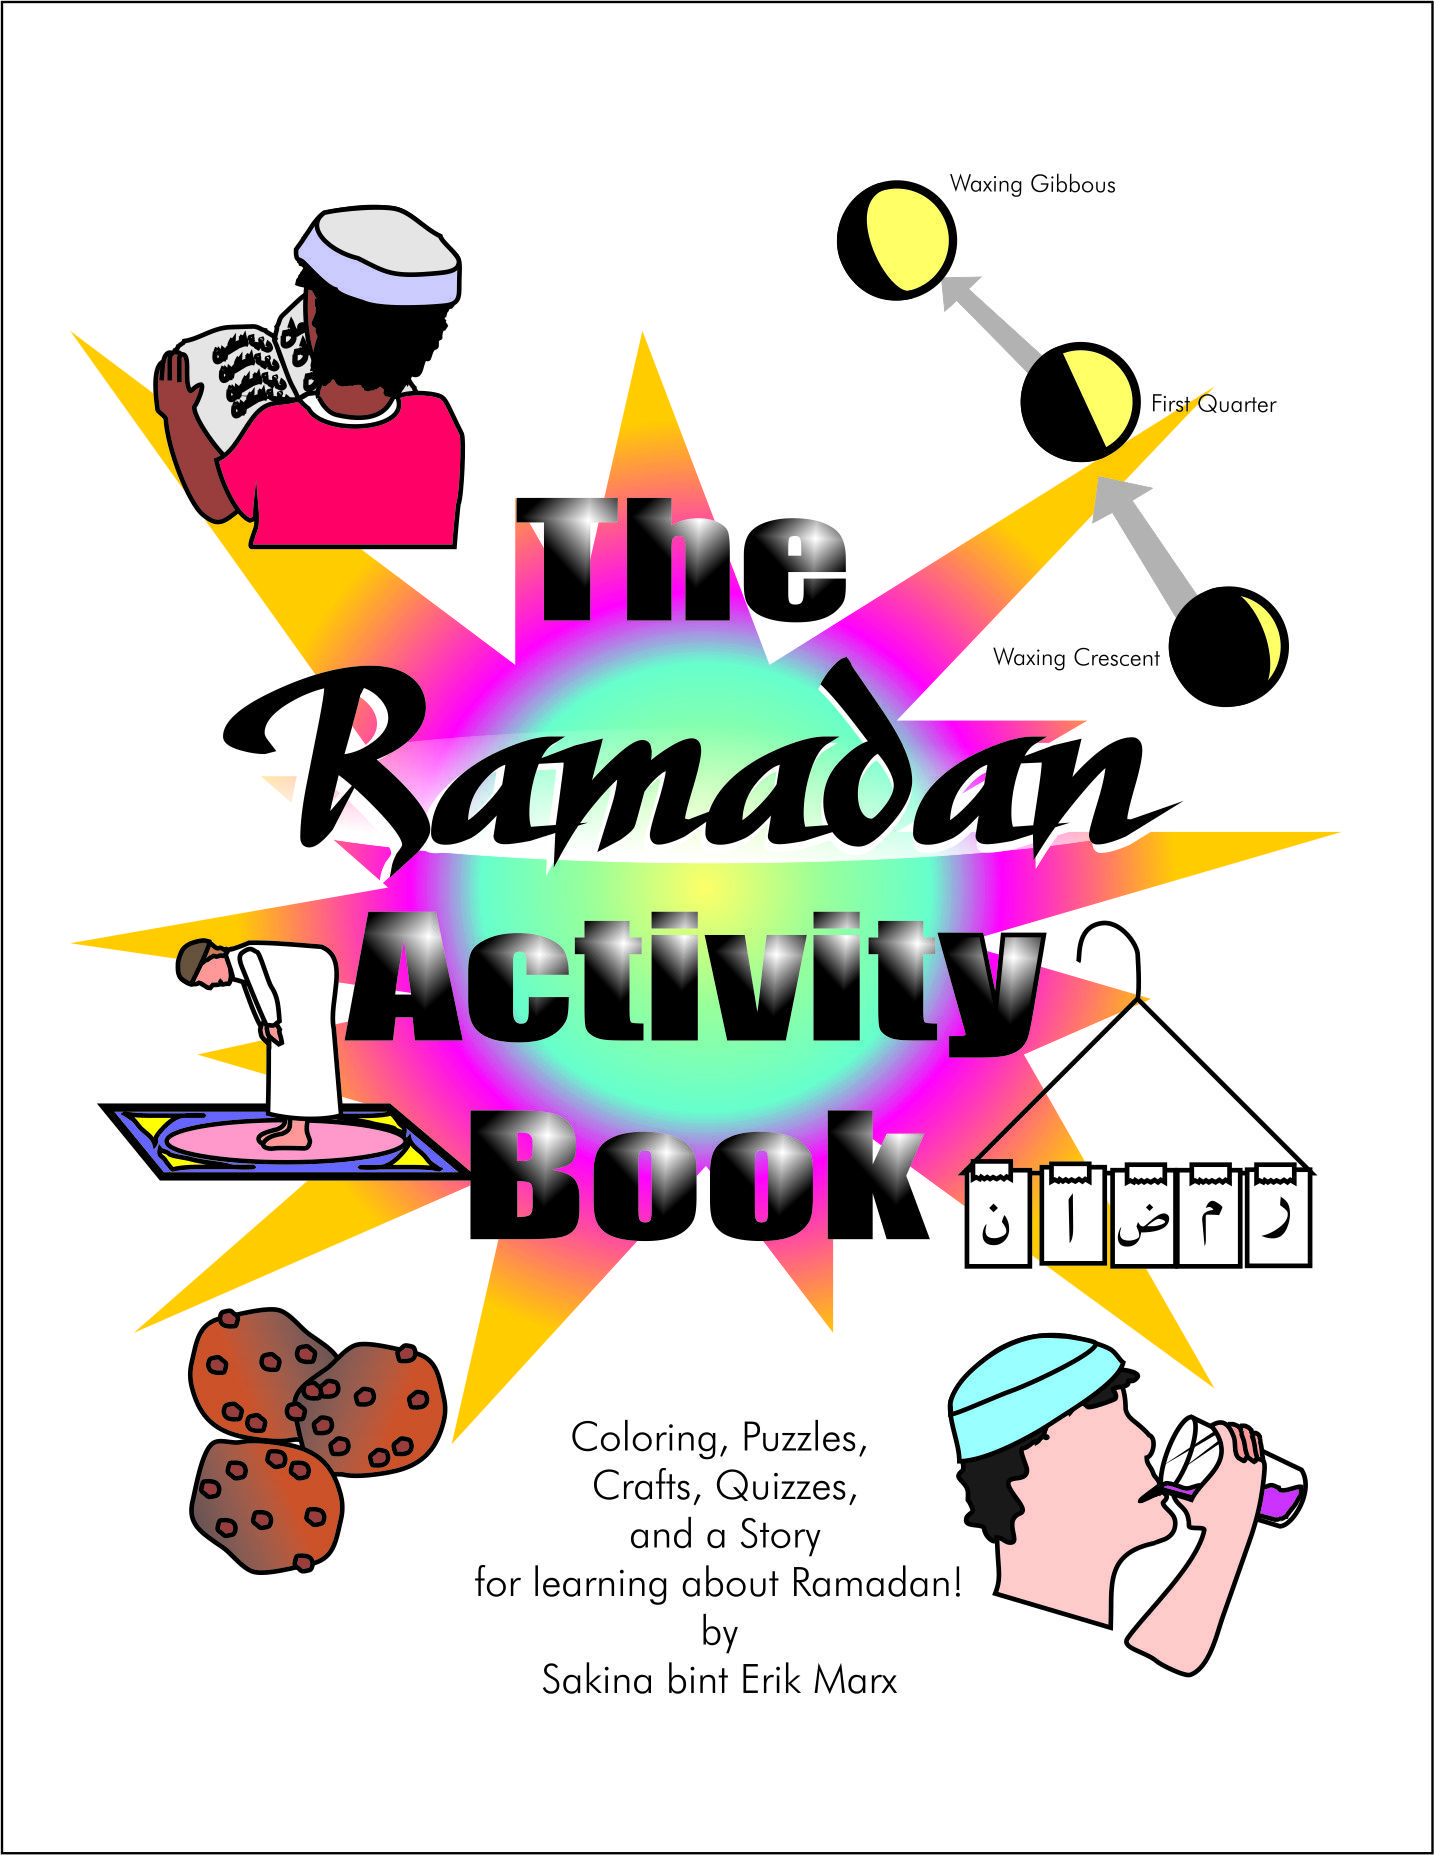 www arabicplayground com ramadan activity book for boys by al